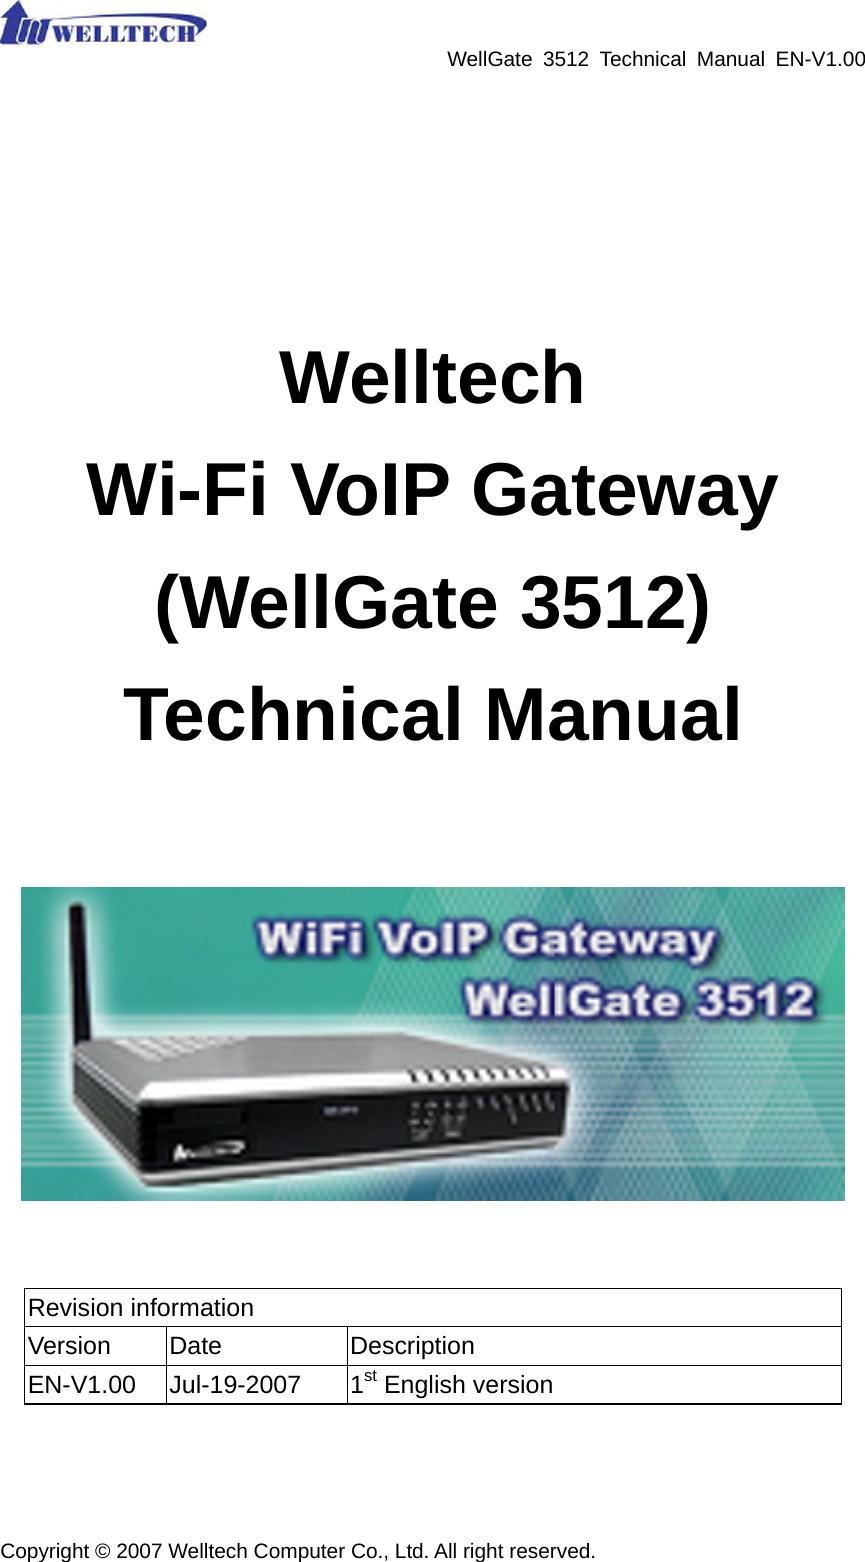 welltech computer wg3512 gateway user manual wg3512 um en v1 00 rh usermanual wiki Gateway Camera Manual Gateway Camera Manual